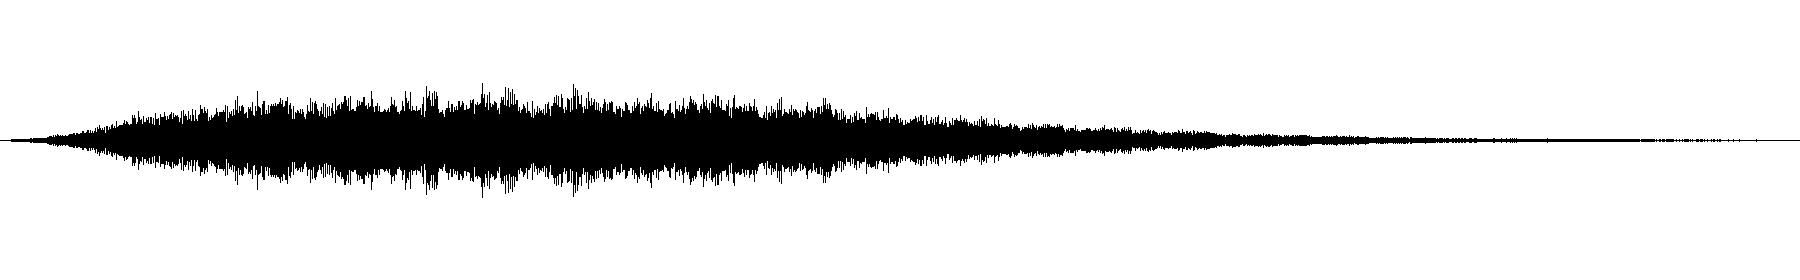 synth choir cm